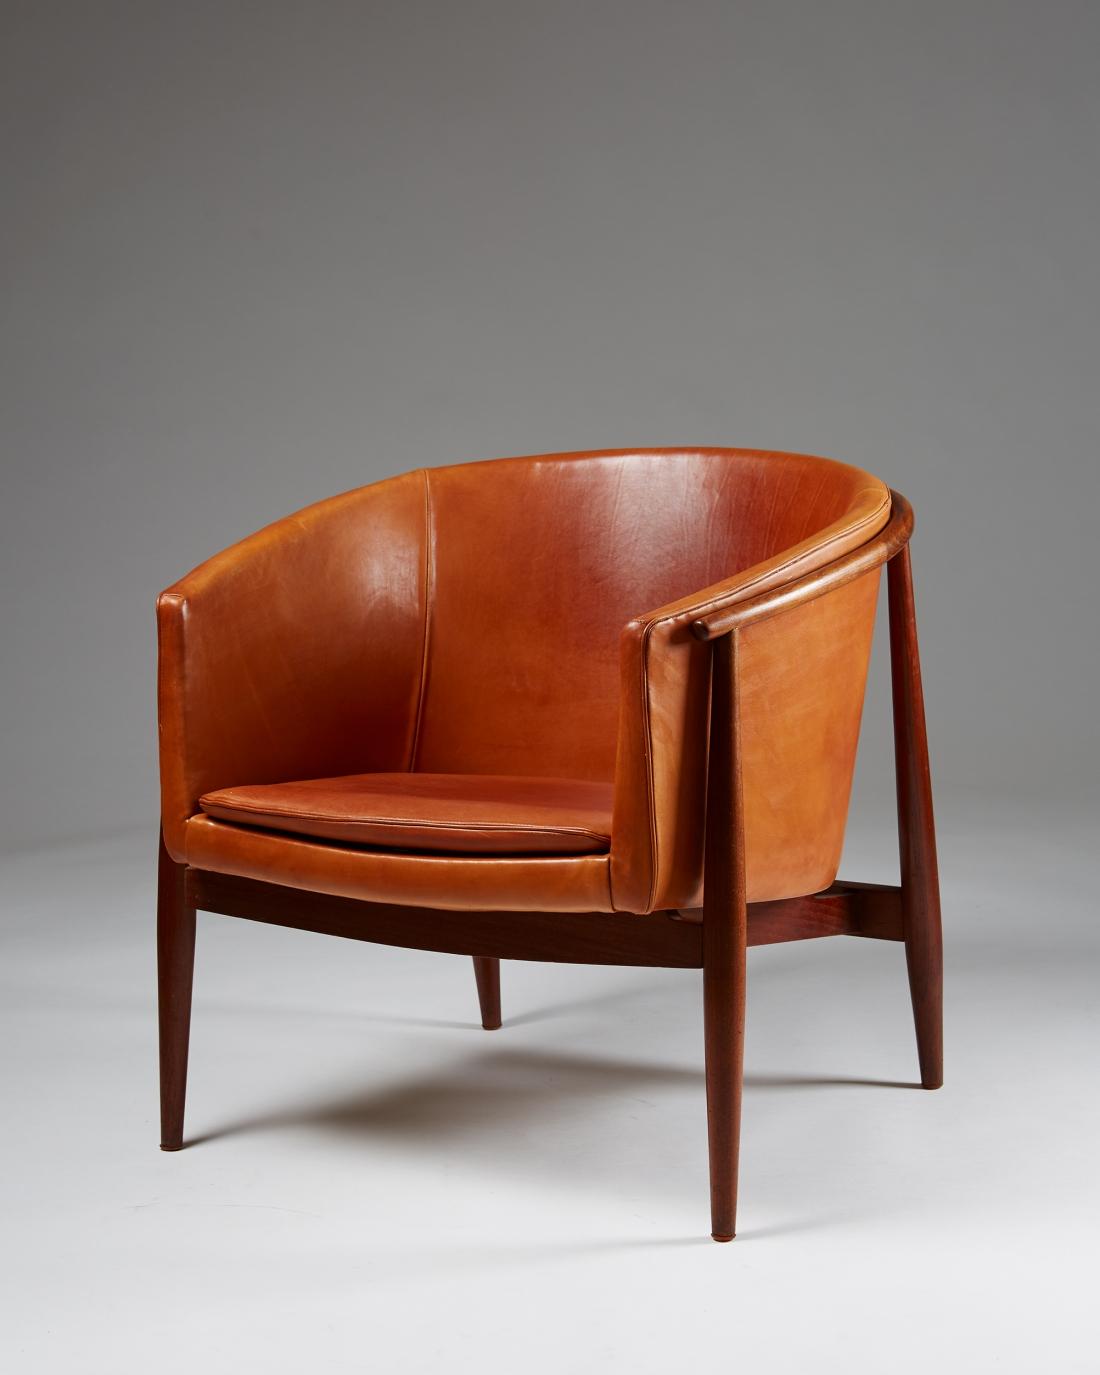 Easy chair model 93 designed by Brockmann Petersen for Poul M. Jessen, Denmark. 1959. Courtesy of Modernity Gallery